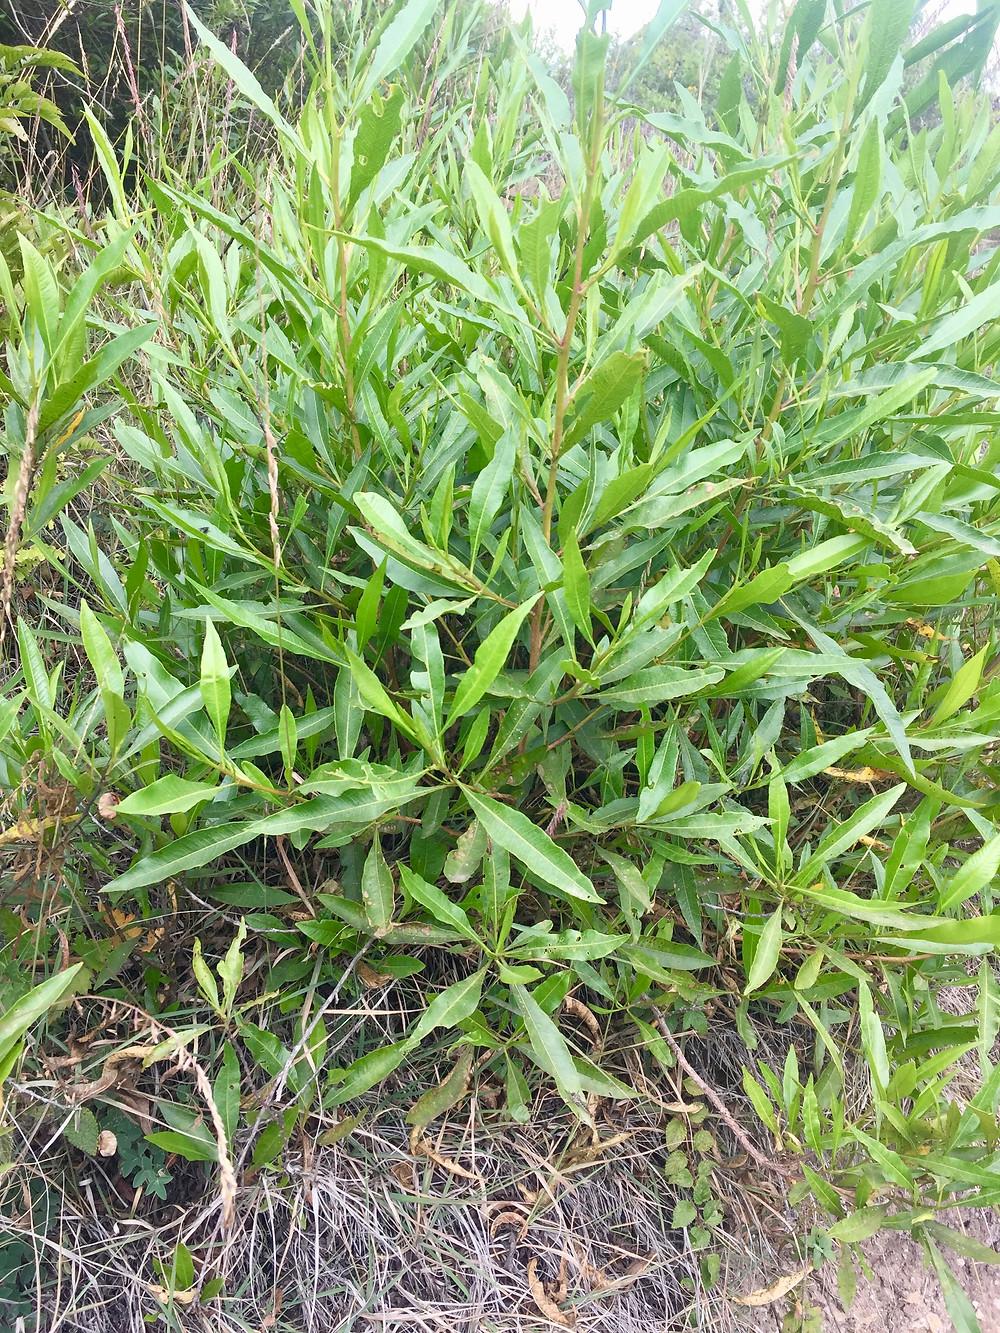 chamana, andean plants, shrub andes, hopbush